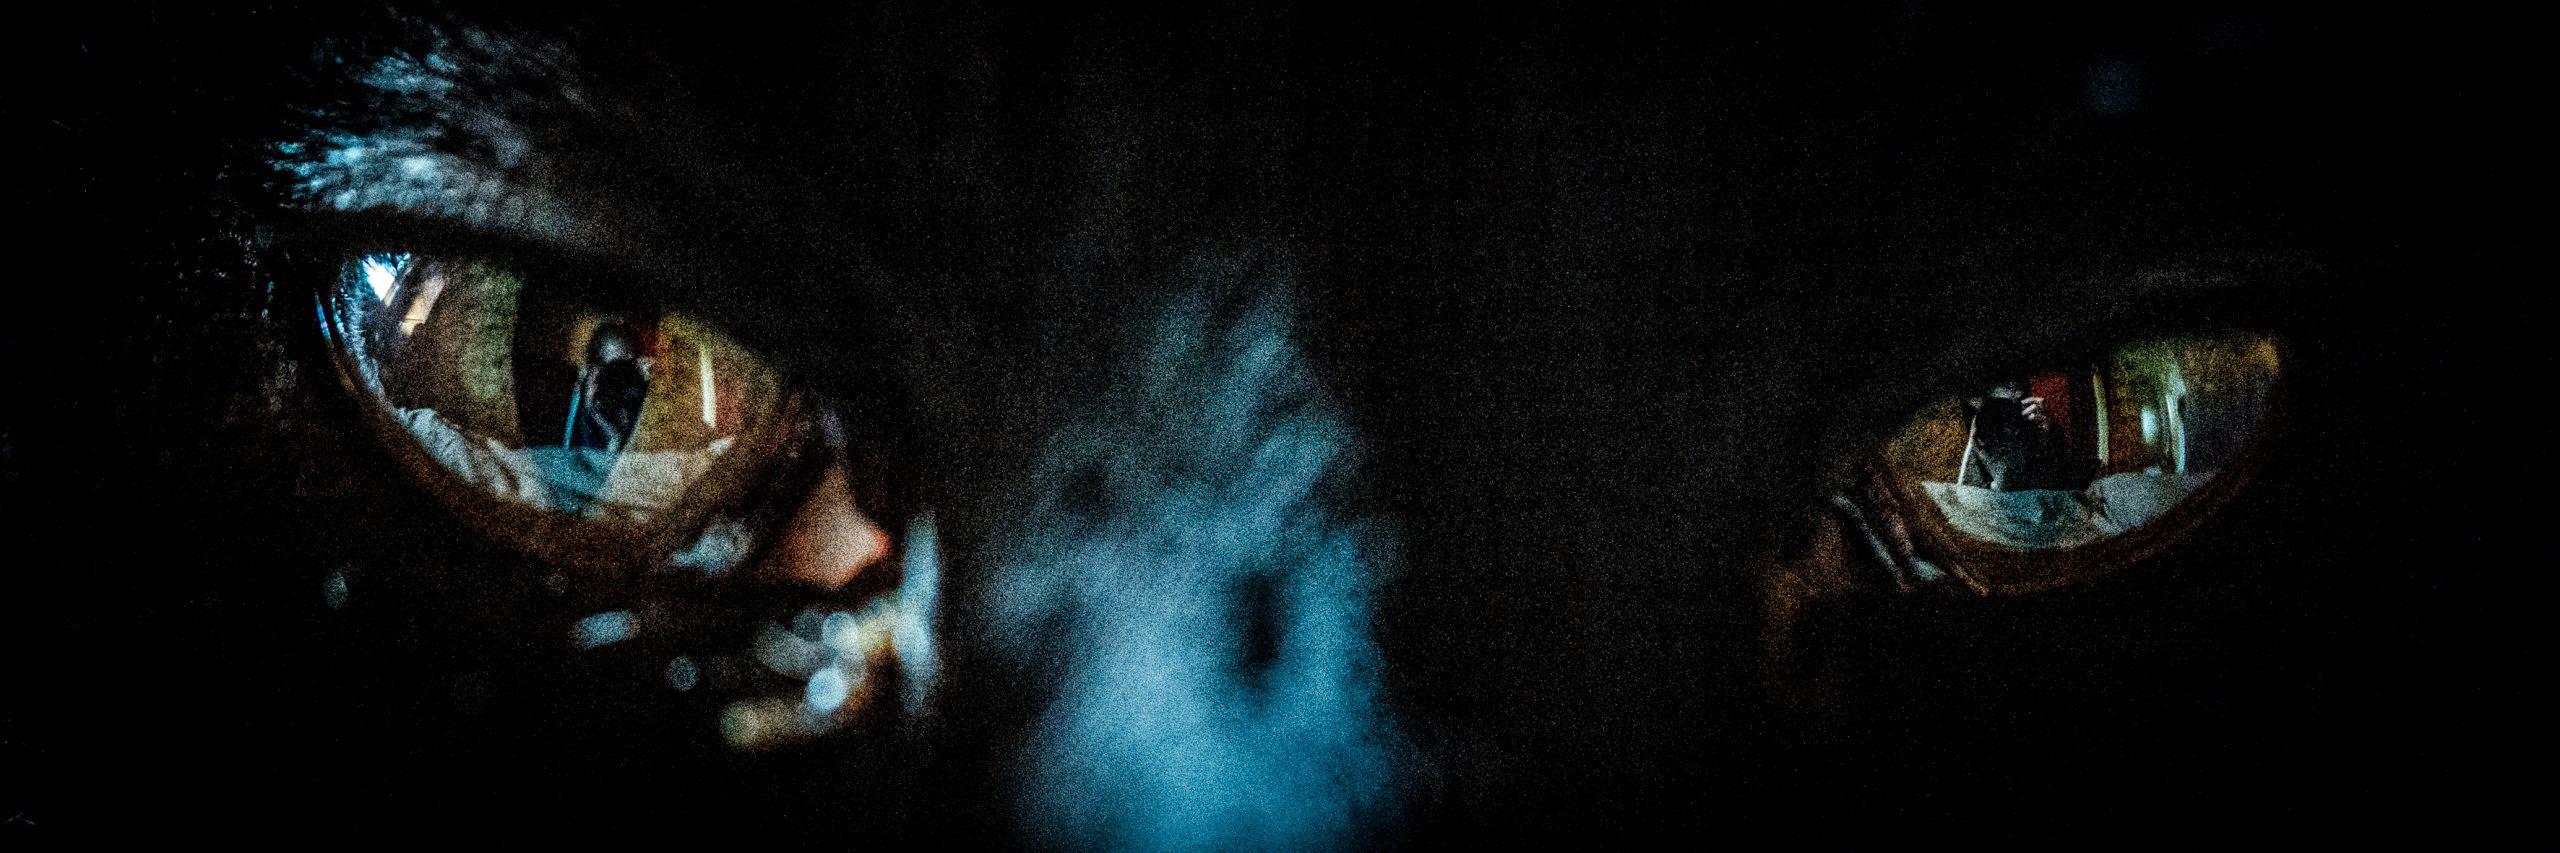 Danièle Sikirdji Schwob Photographie